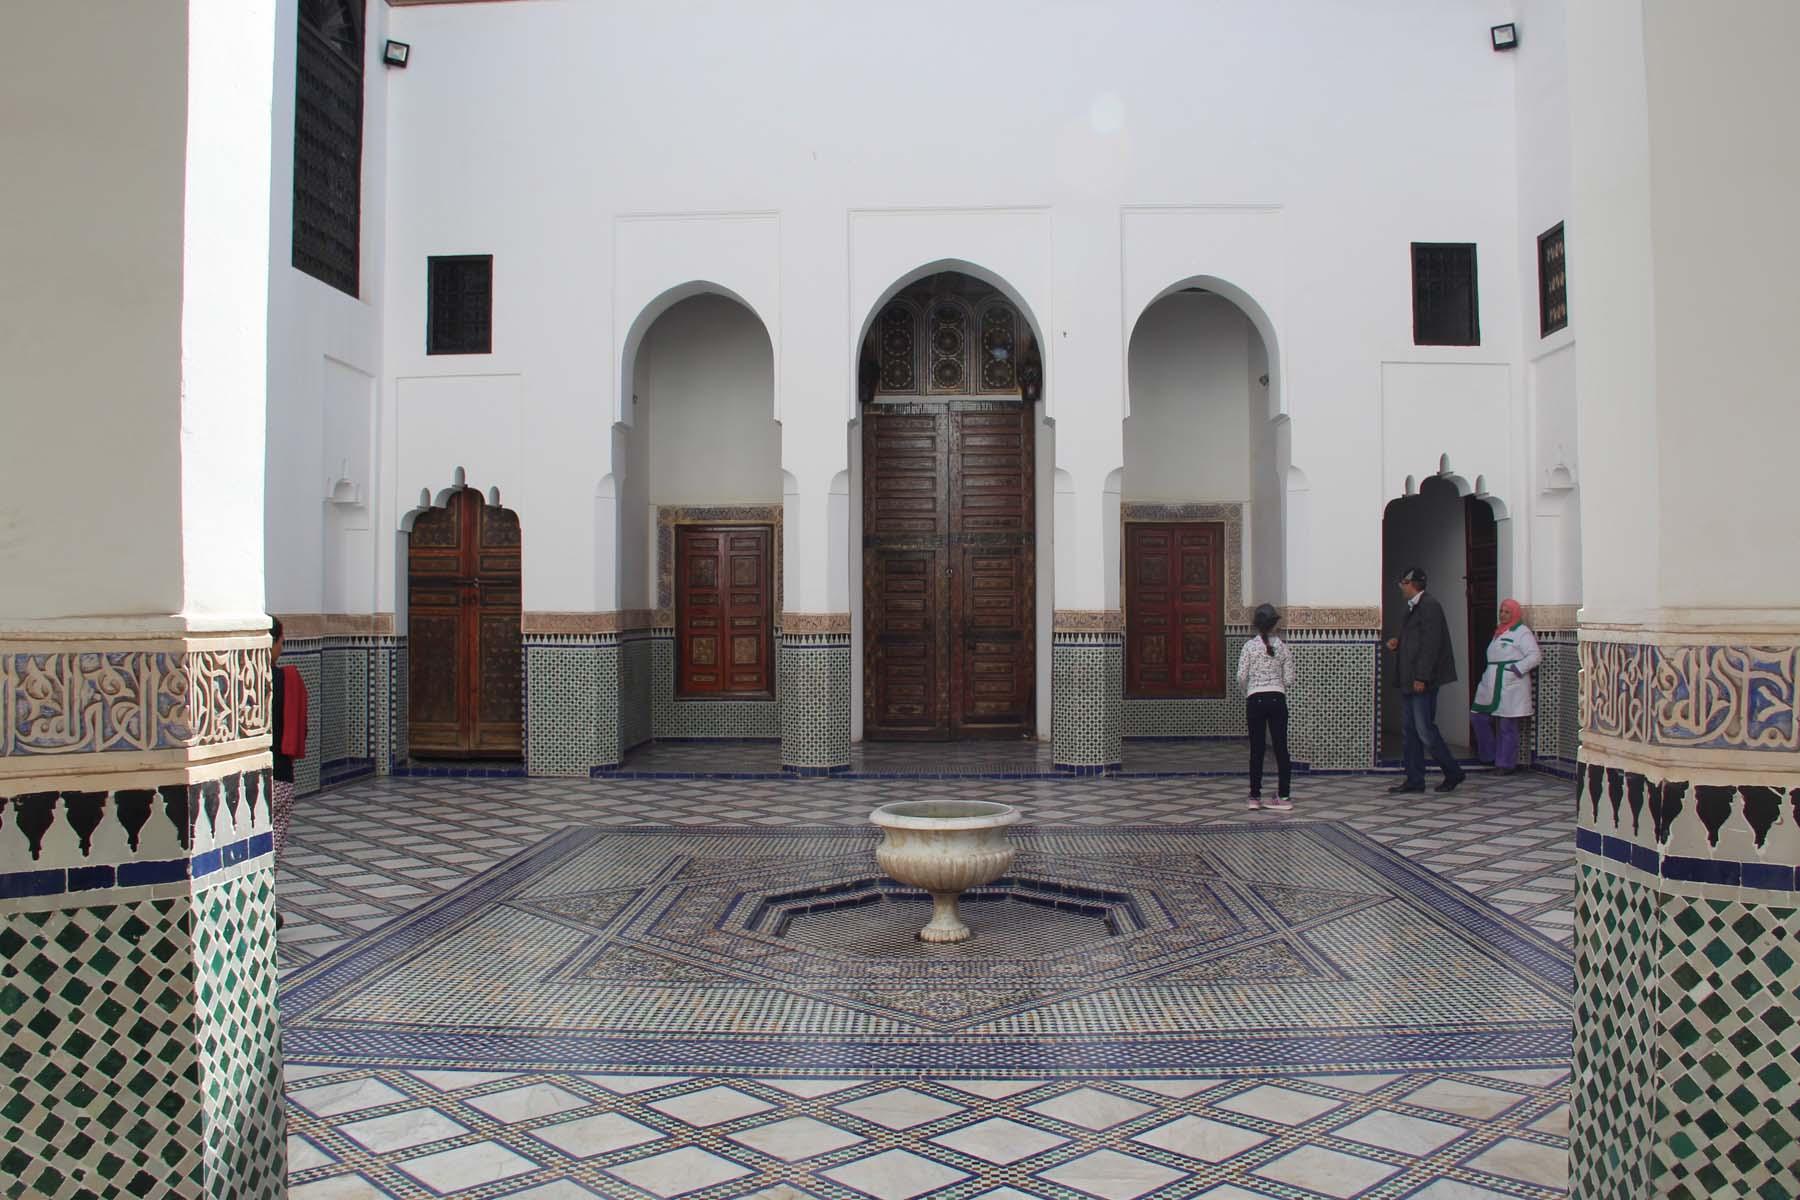 Courtyard in Marrakech Dar Si Said